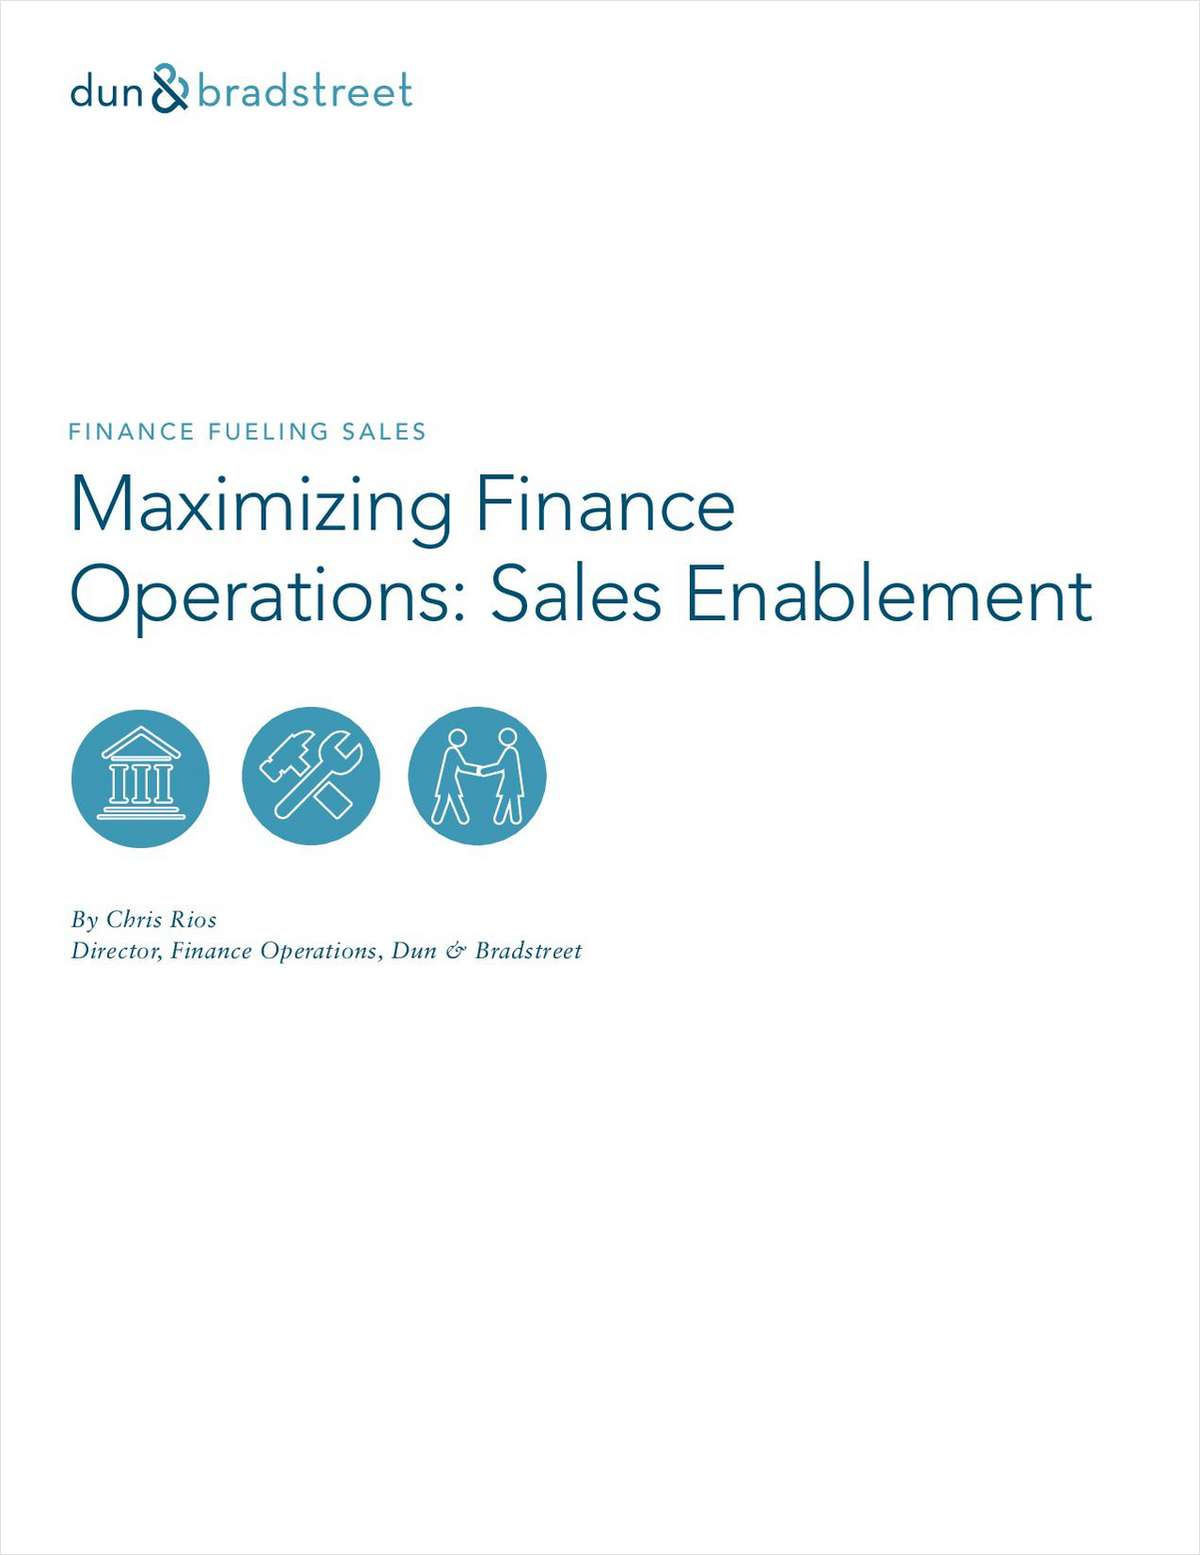 Maximizing Finance Operations: Sales Enablement